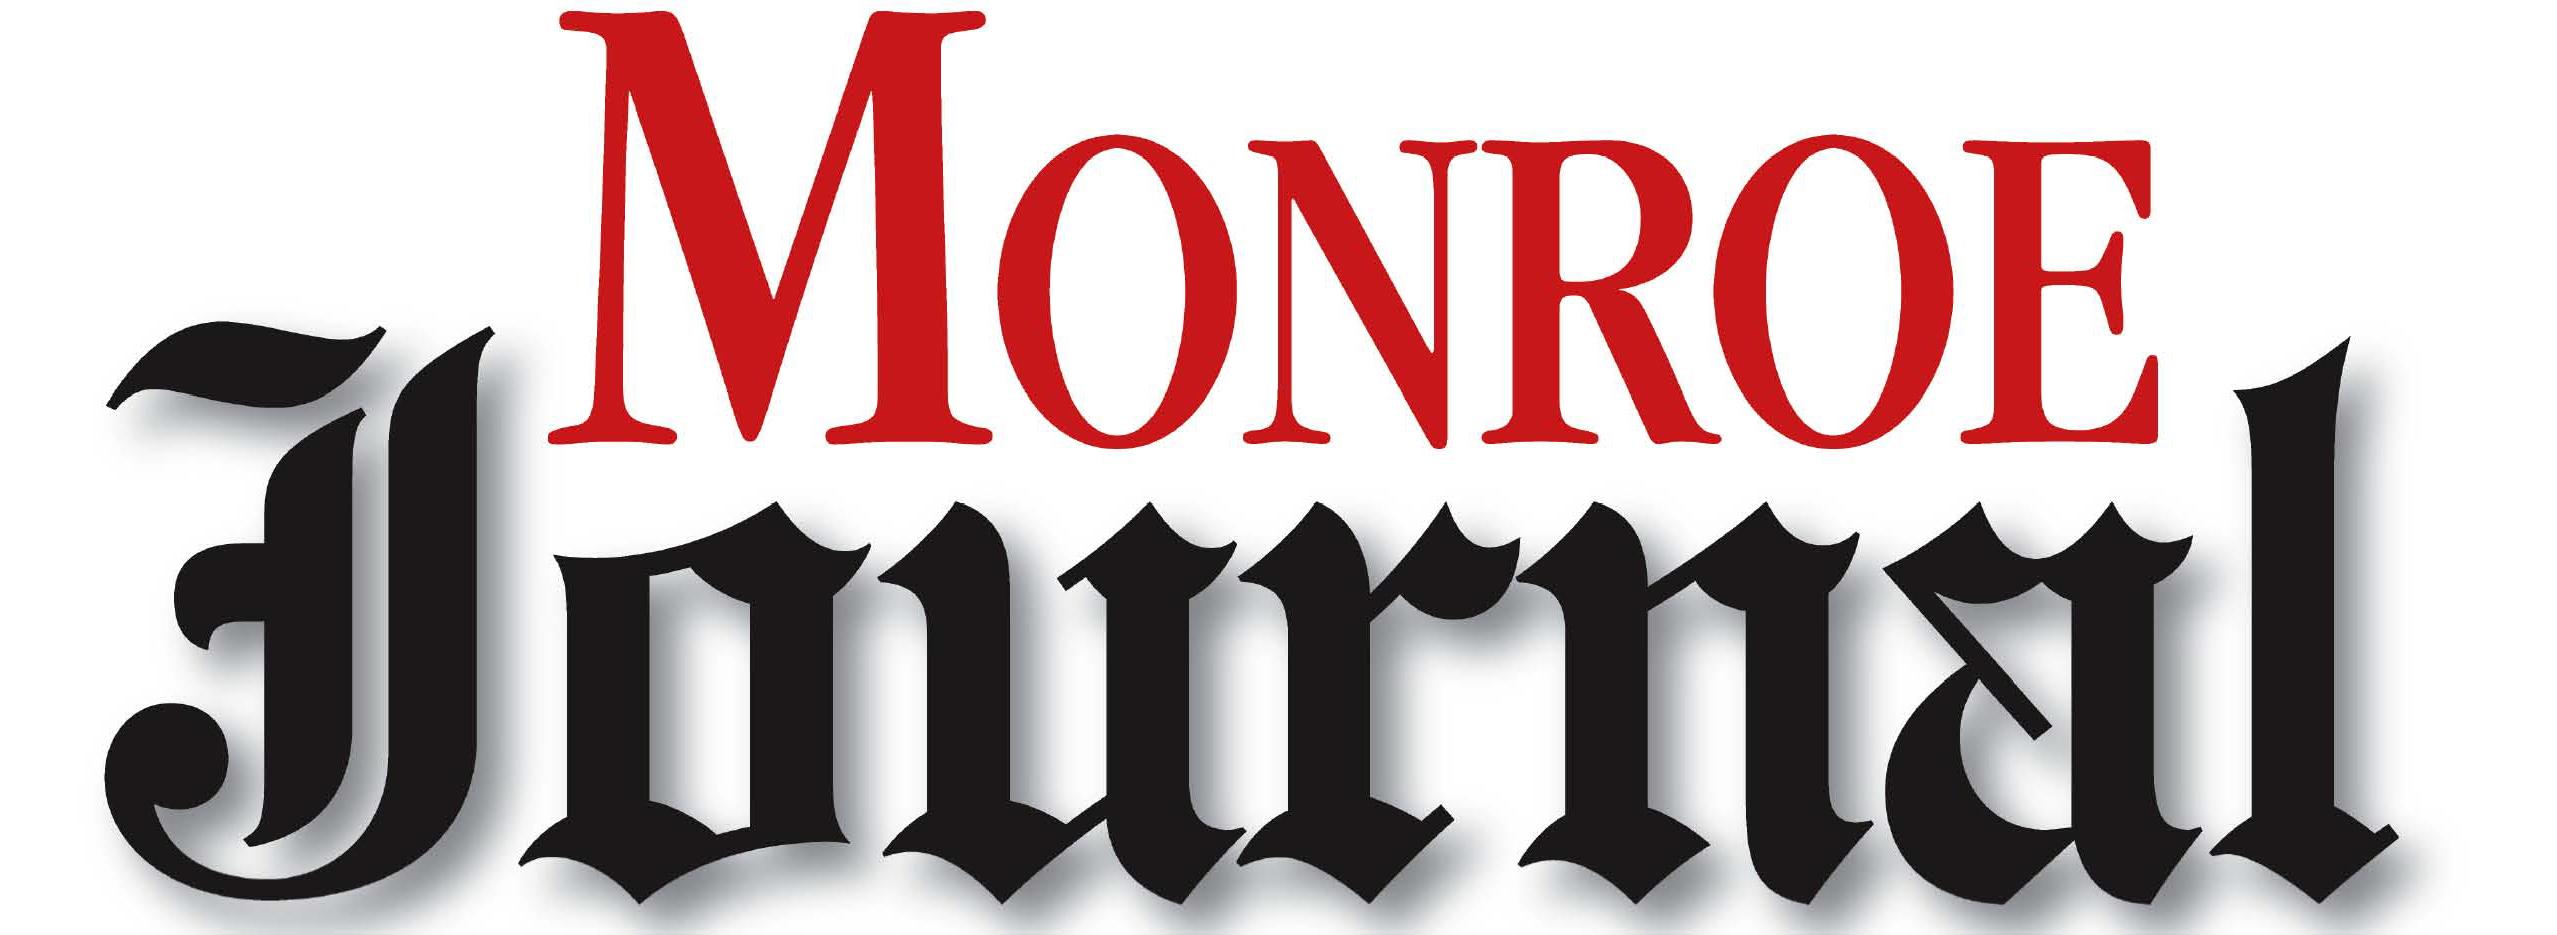 Mississippi monroe county amory - Monroe Journal